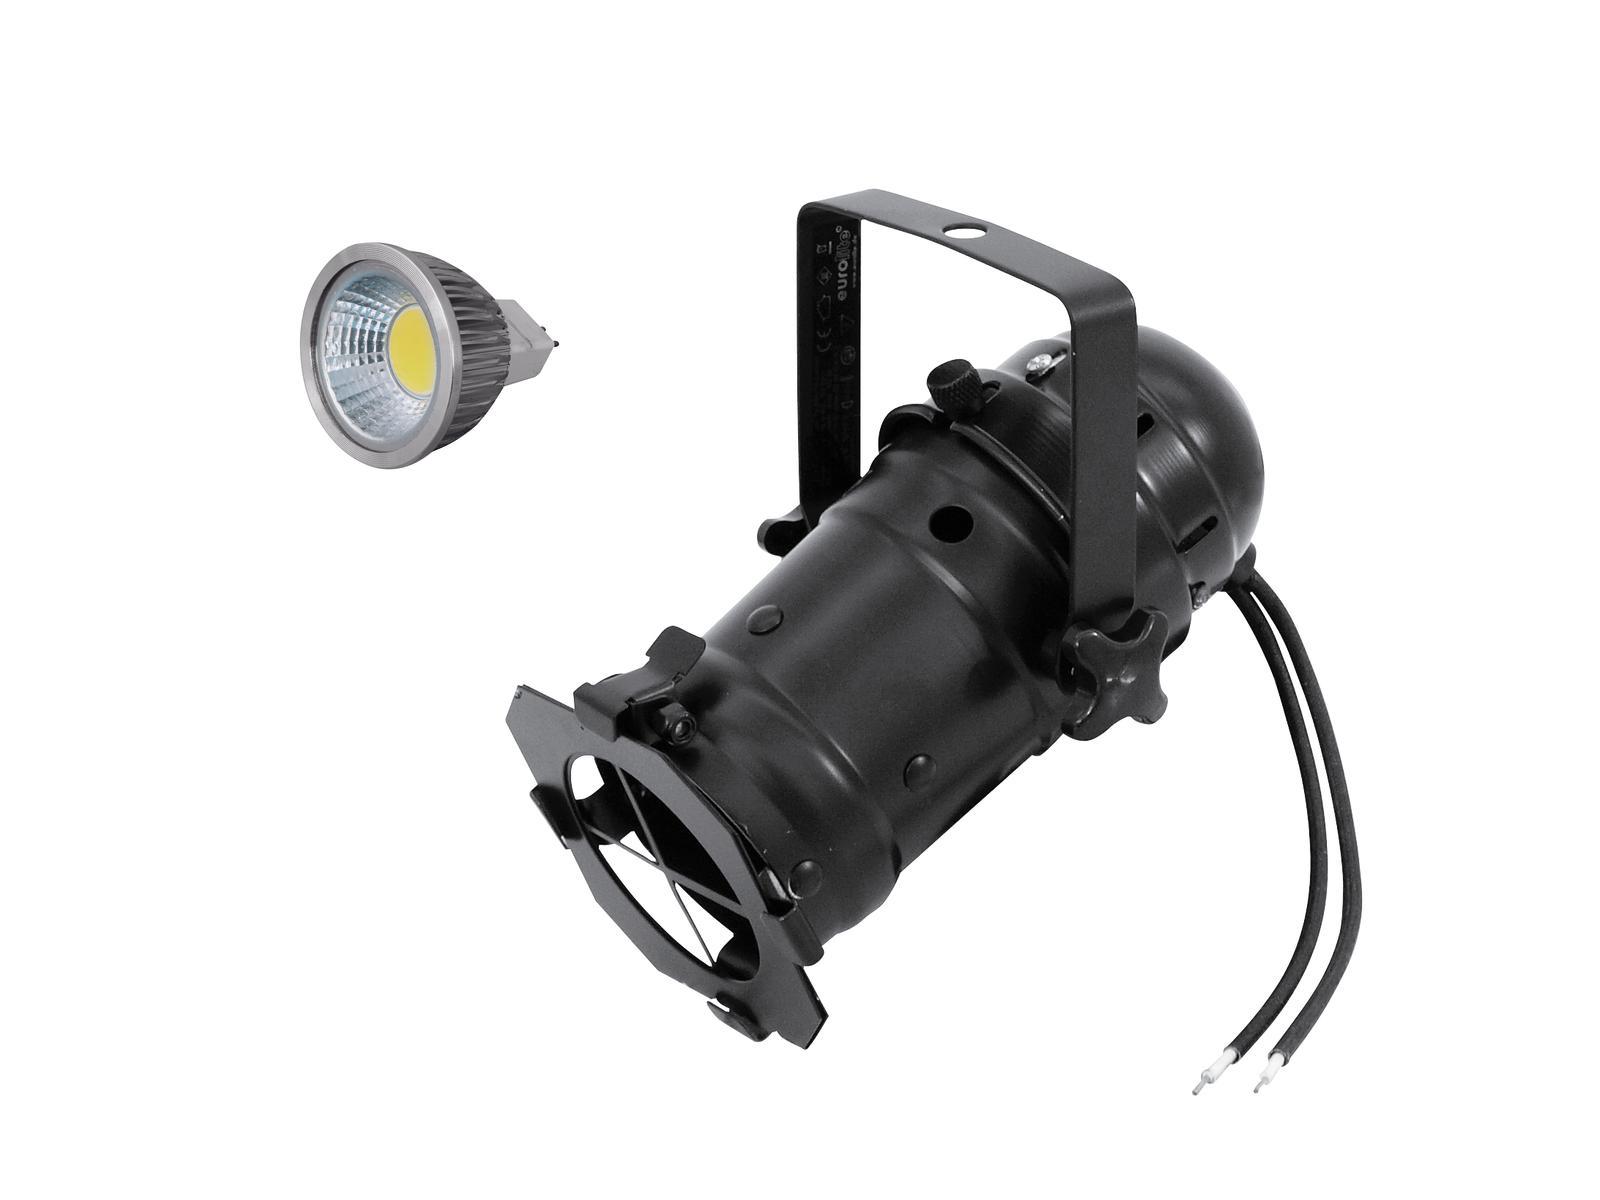 EUROLITE Impostare PAR-16 Spot bk + MR-16 12V GX-5,3 5W COB LED 6400K